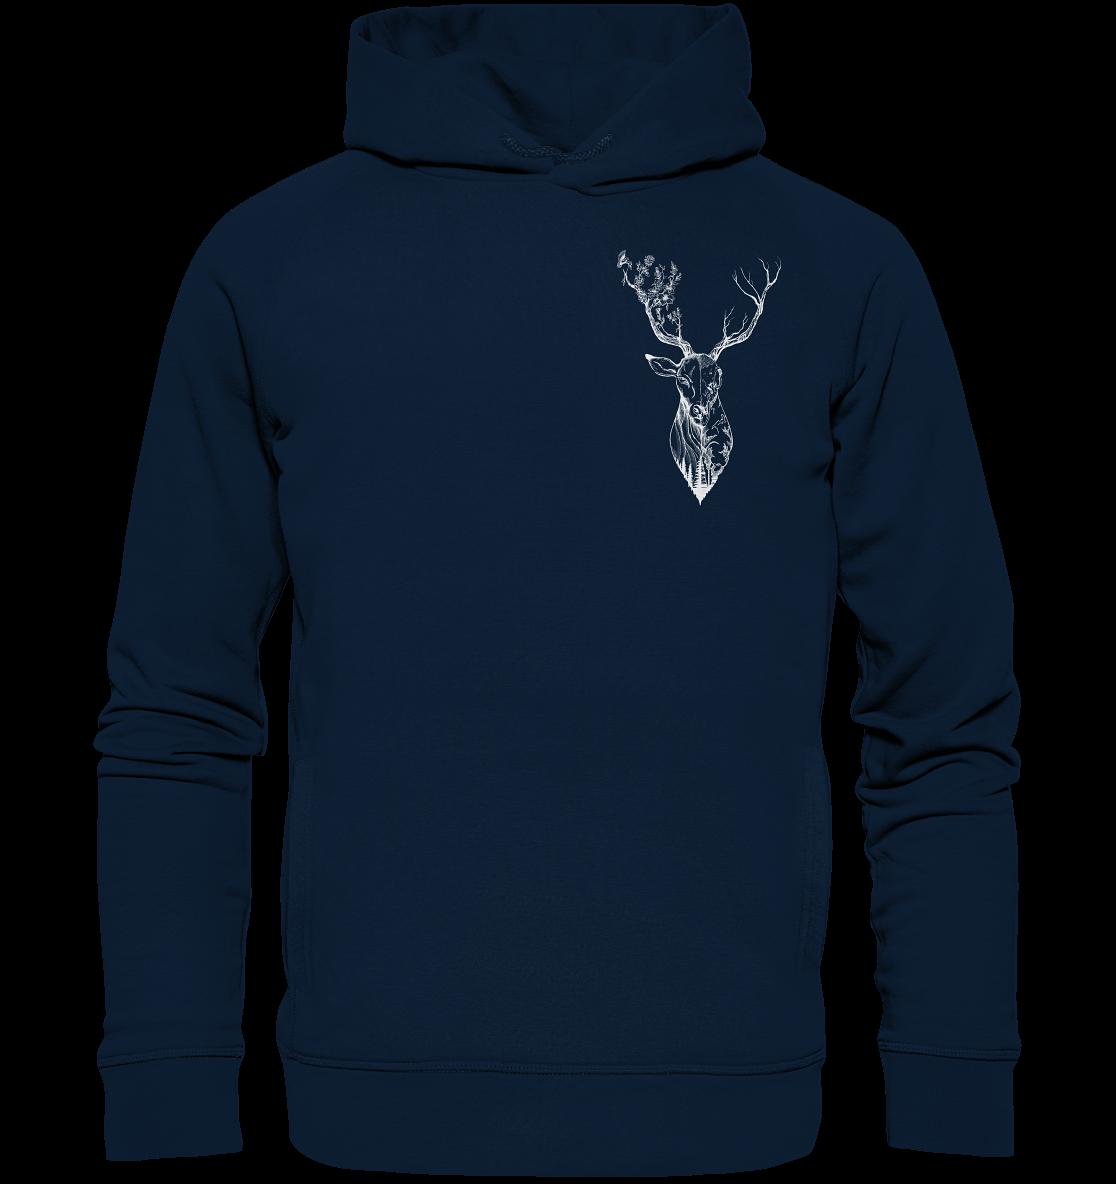 front-organic-fashion-hoodie-0e2035-1116x-6.png